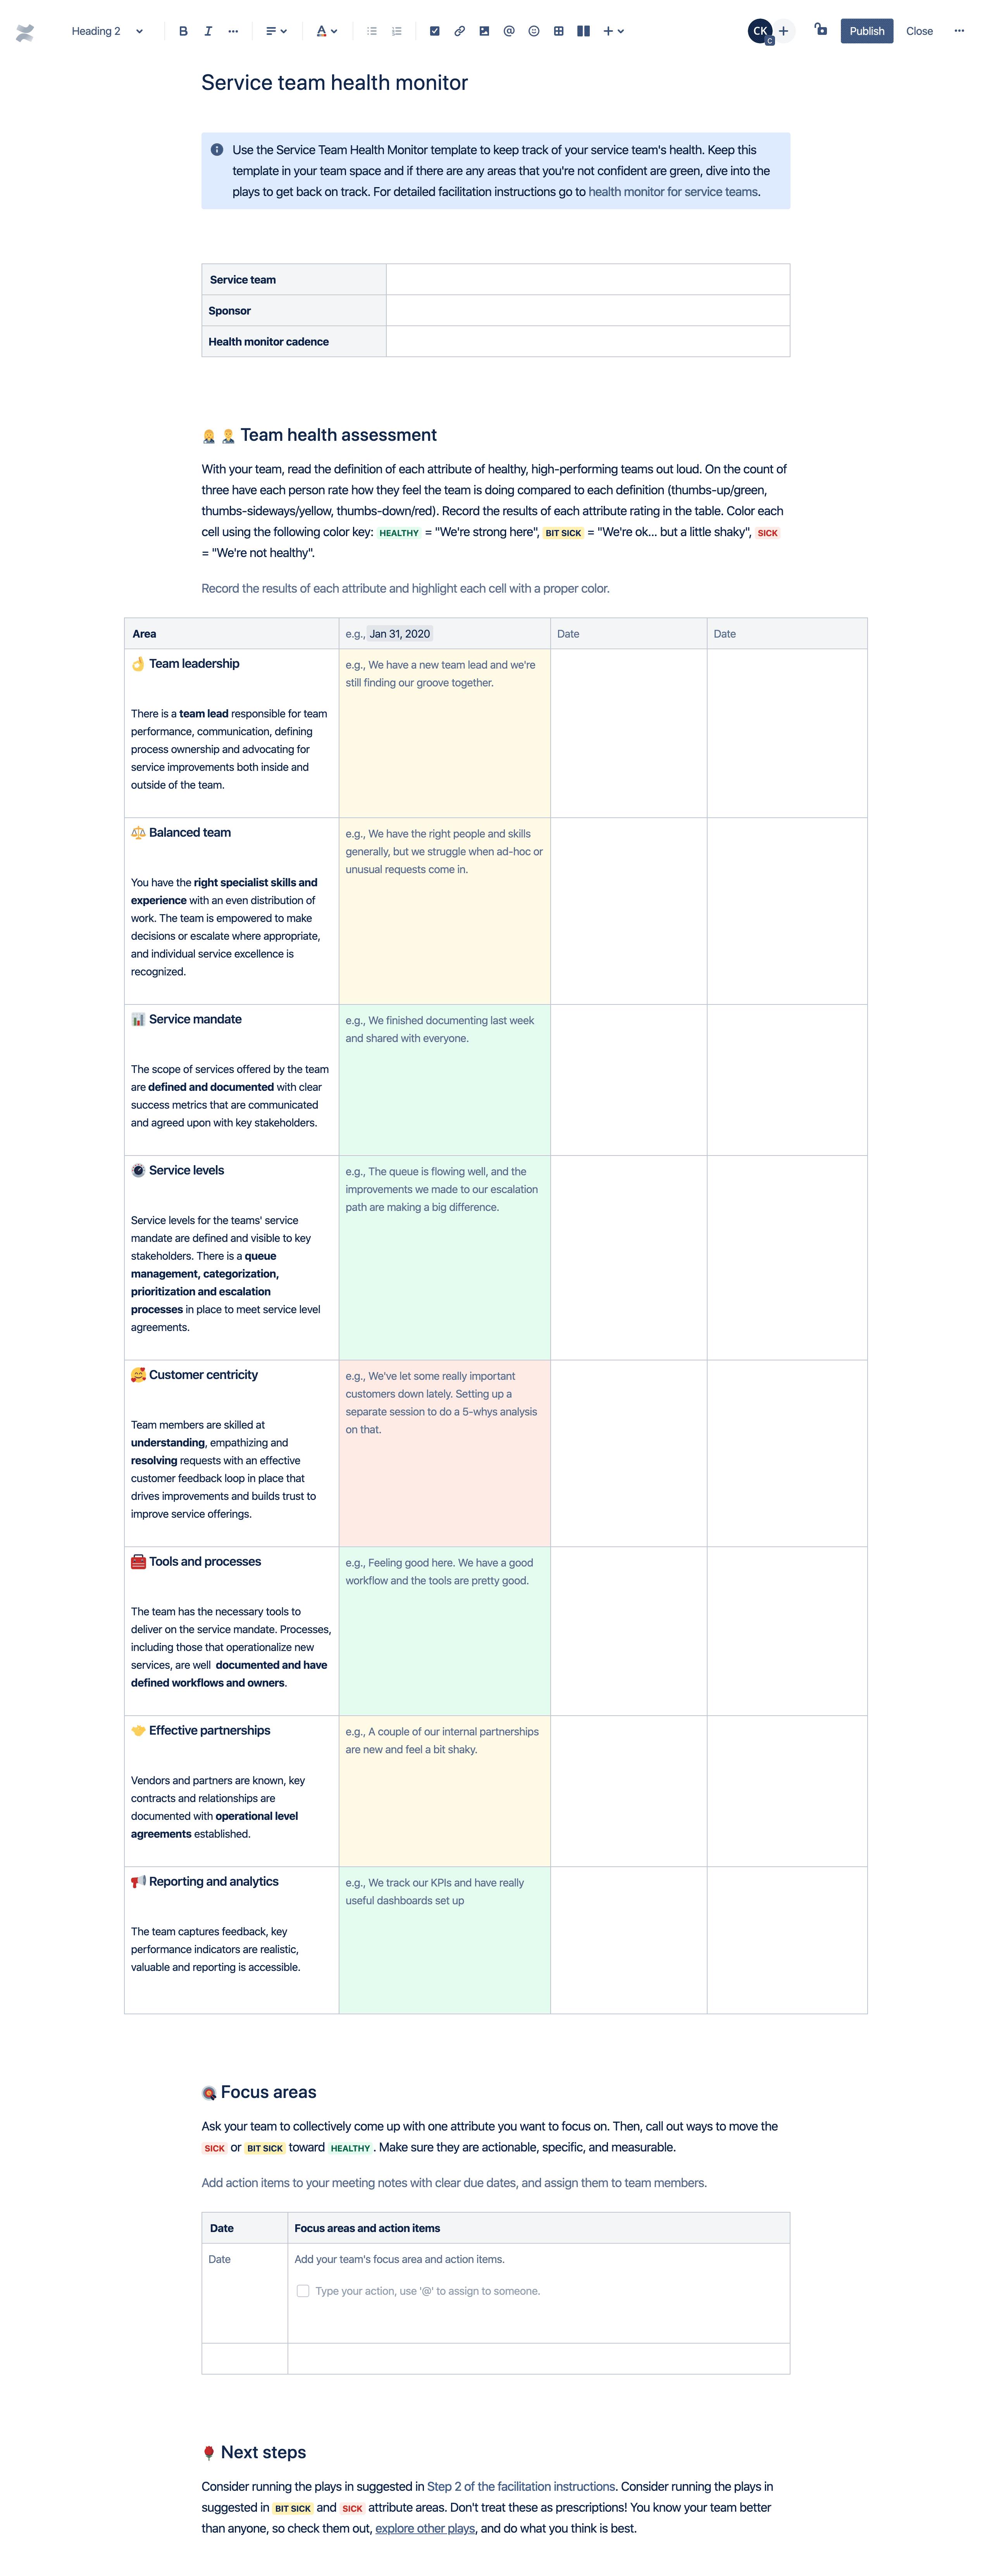 Service team health monitor template